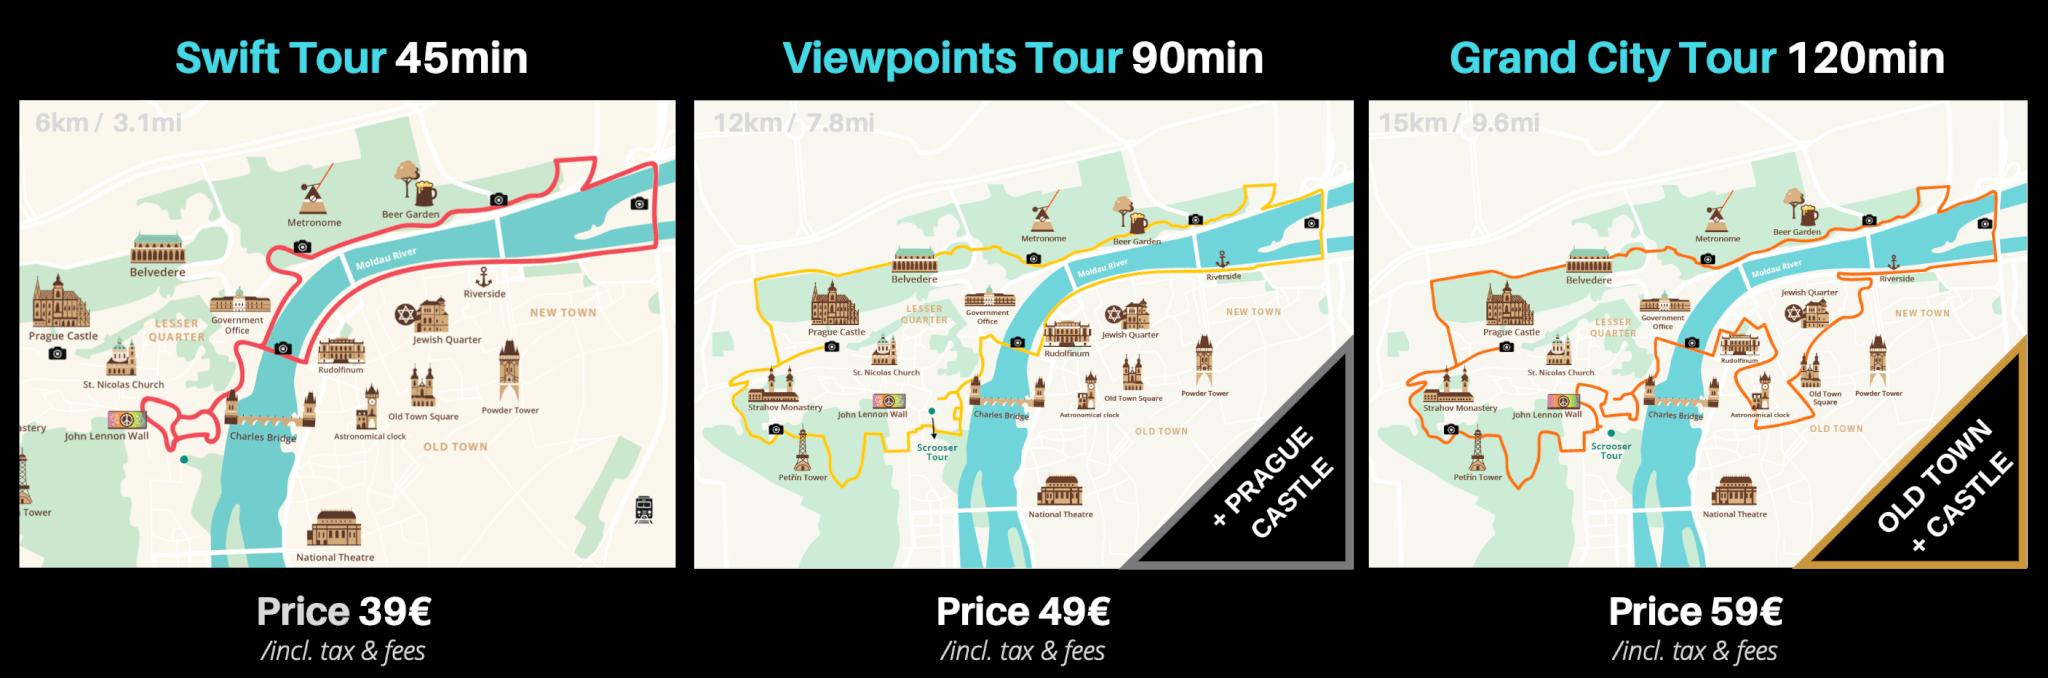 Scrooser tour prague prices